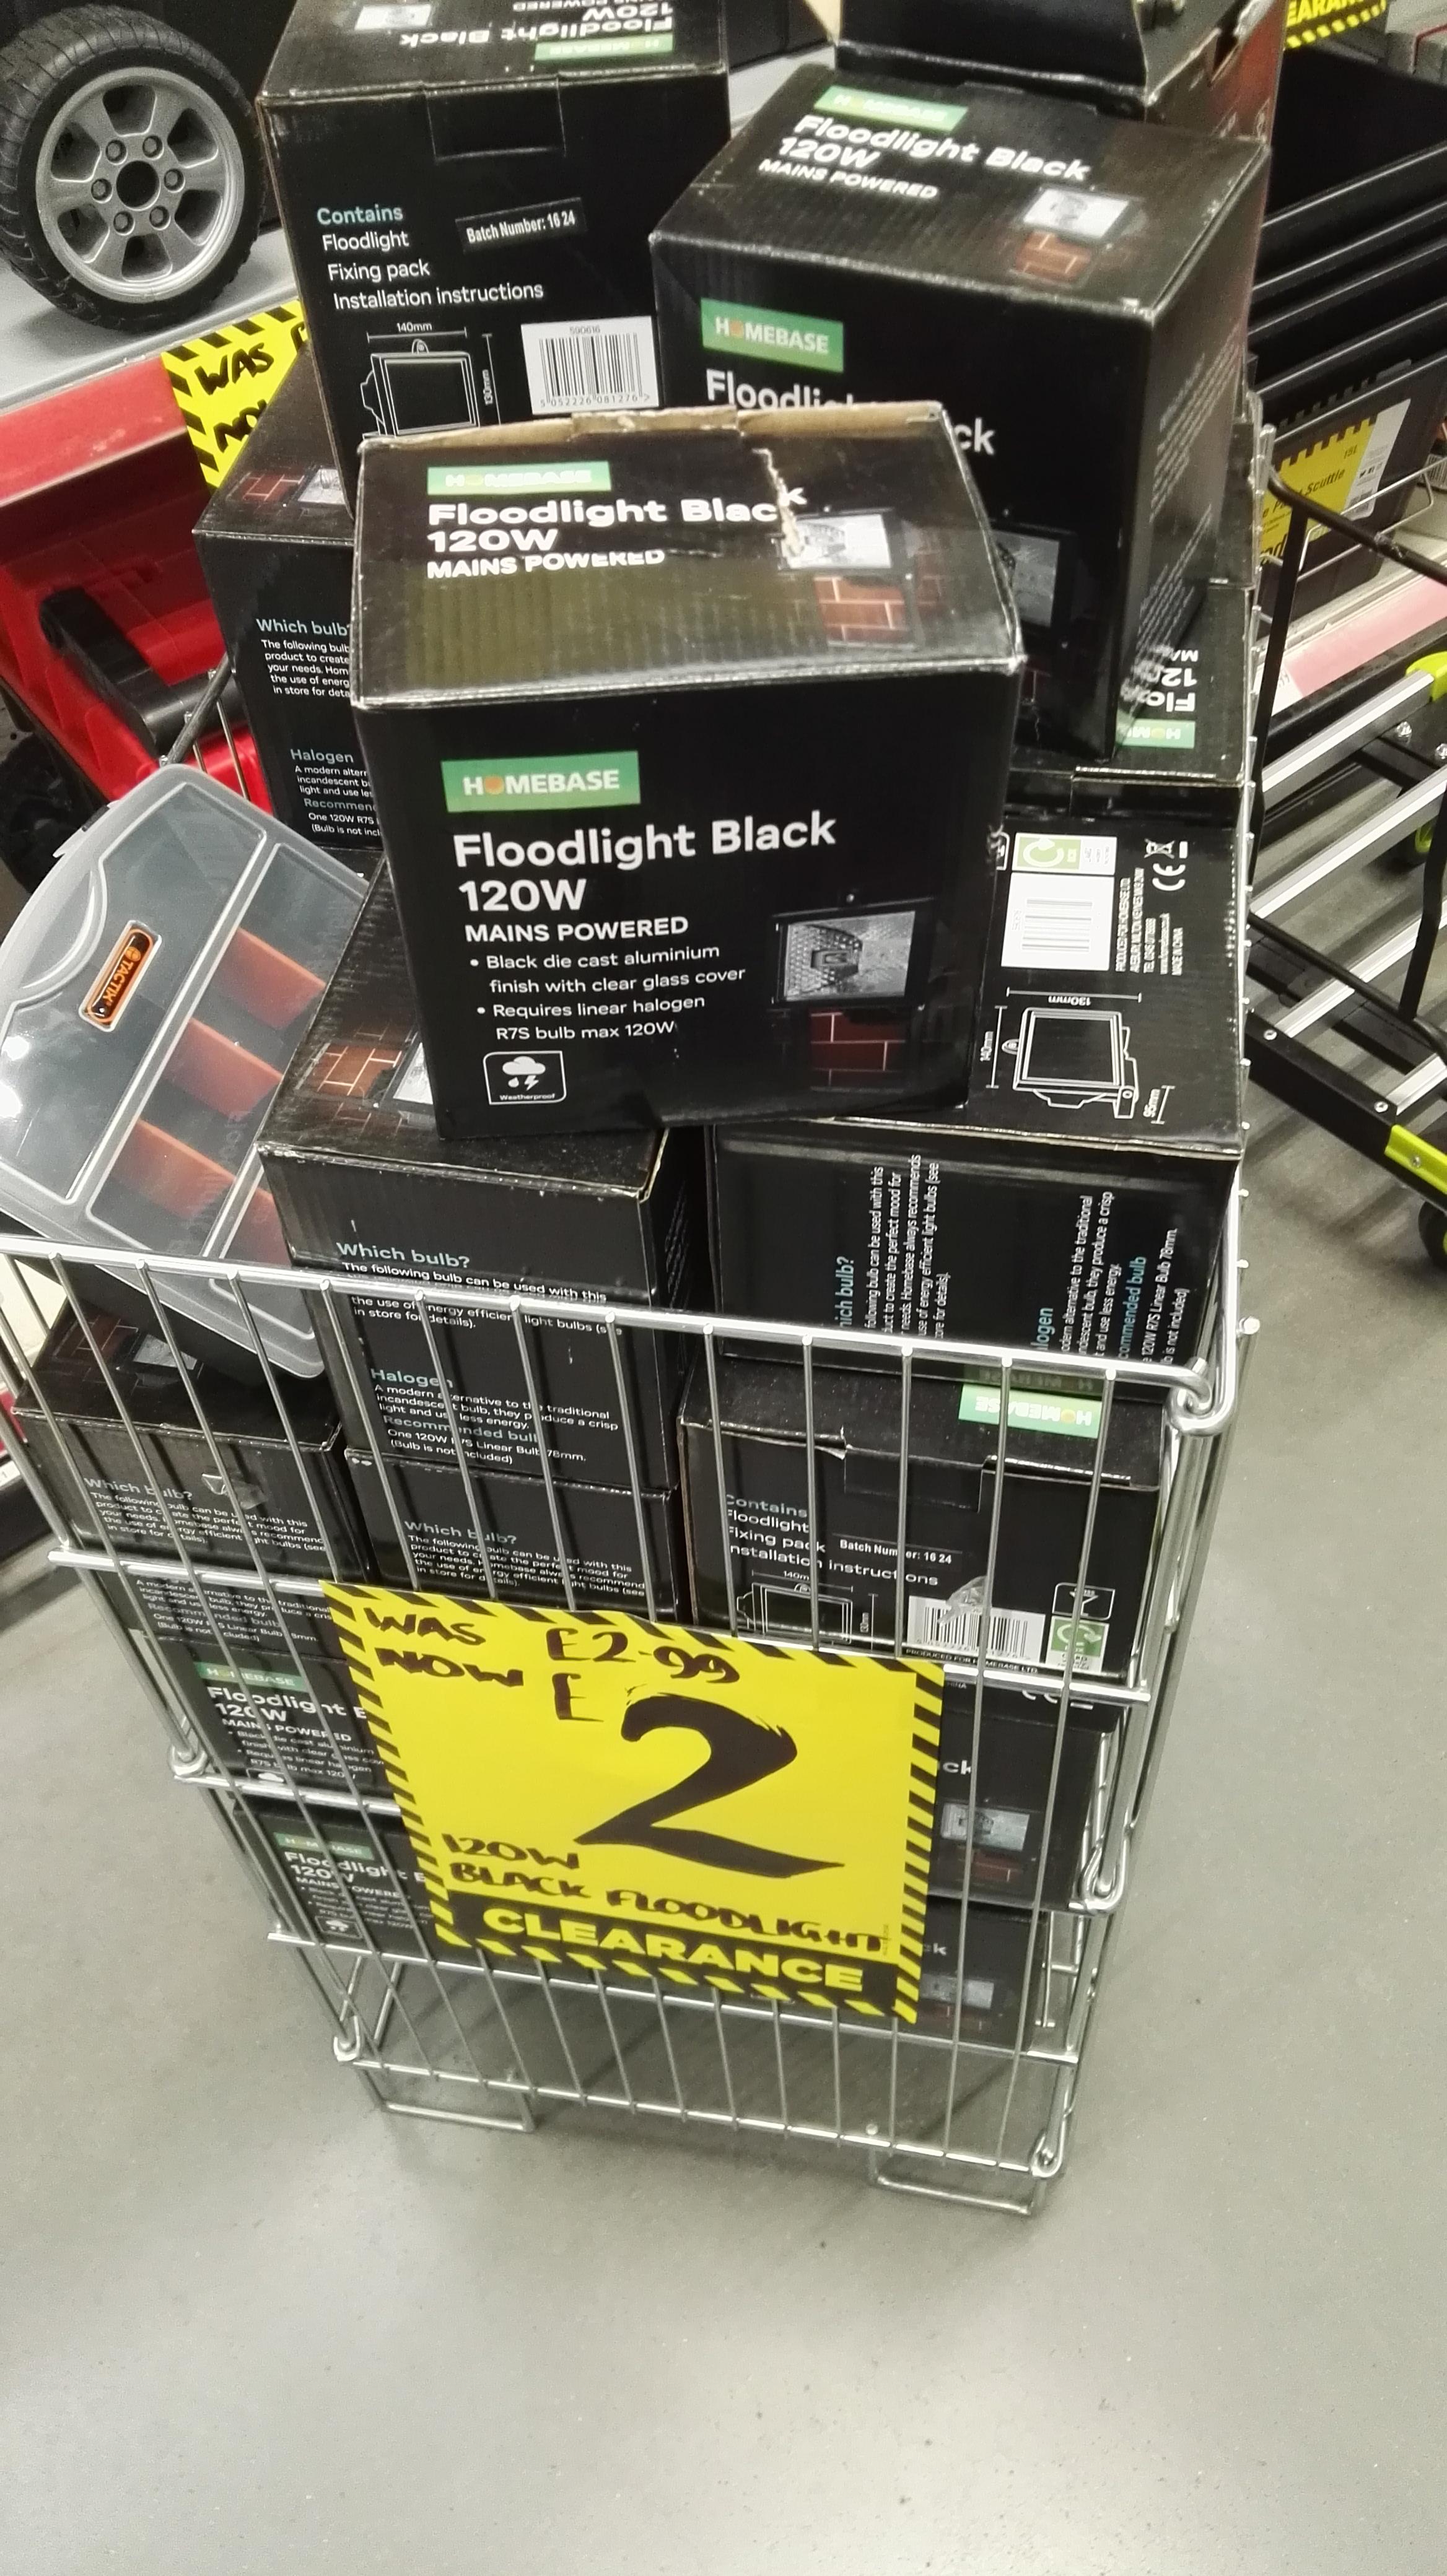 Homebase Mains Powered 120w Black Floodlight £2